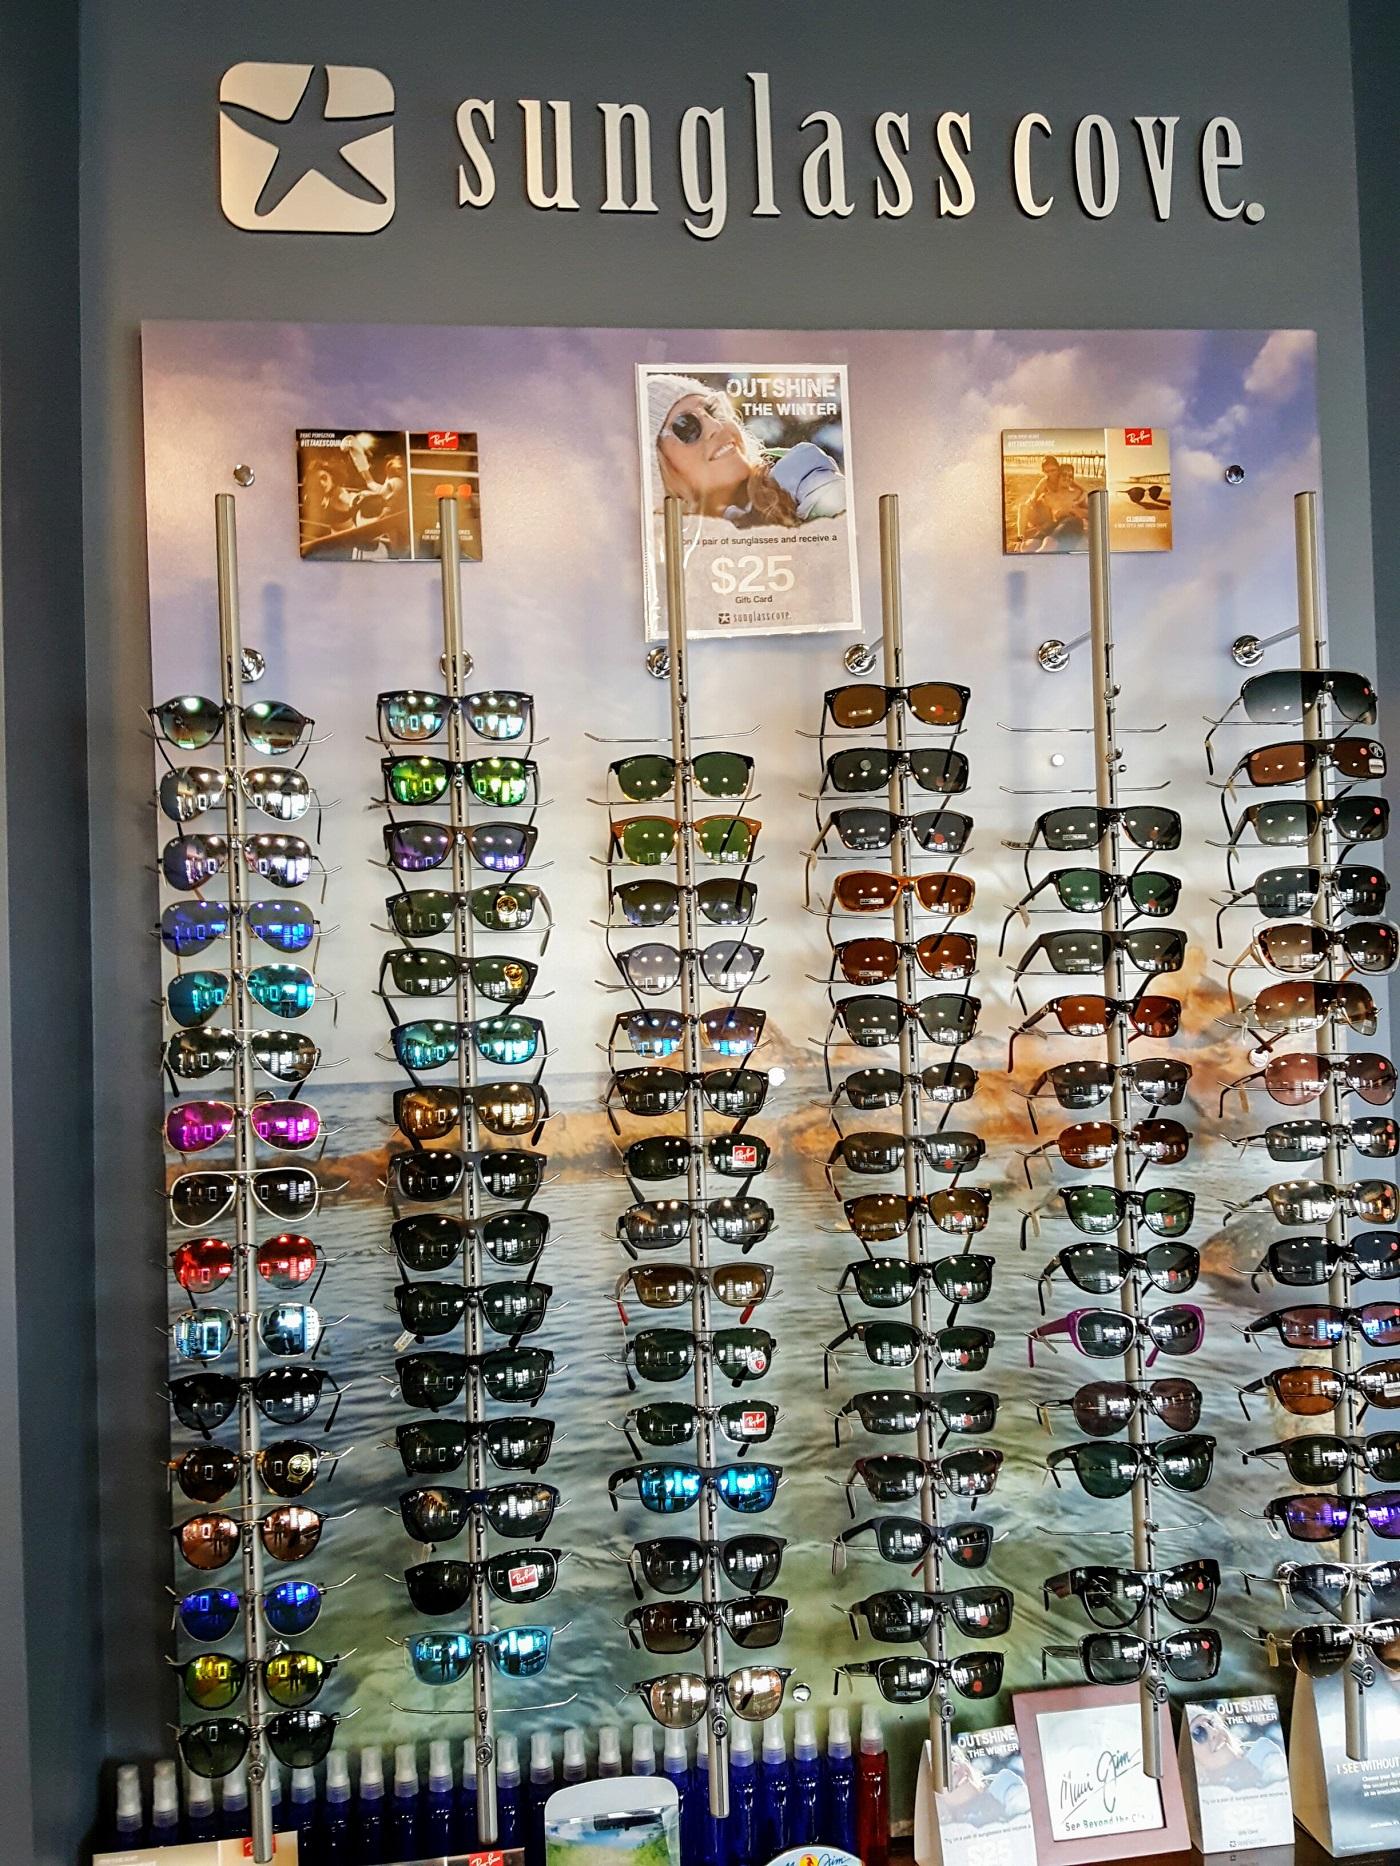 sunglasses cove